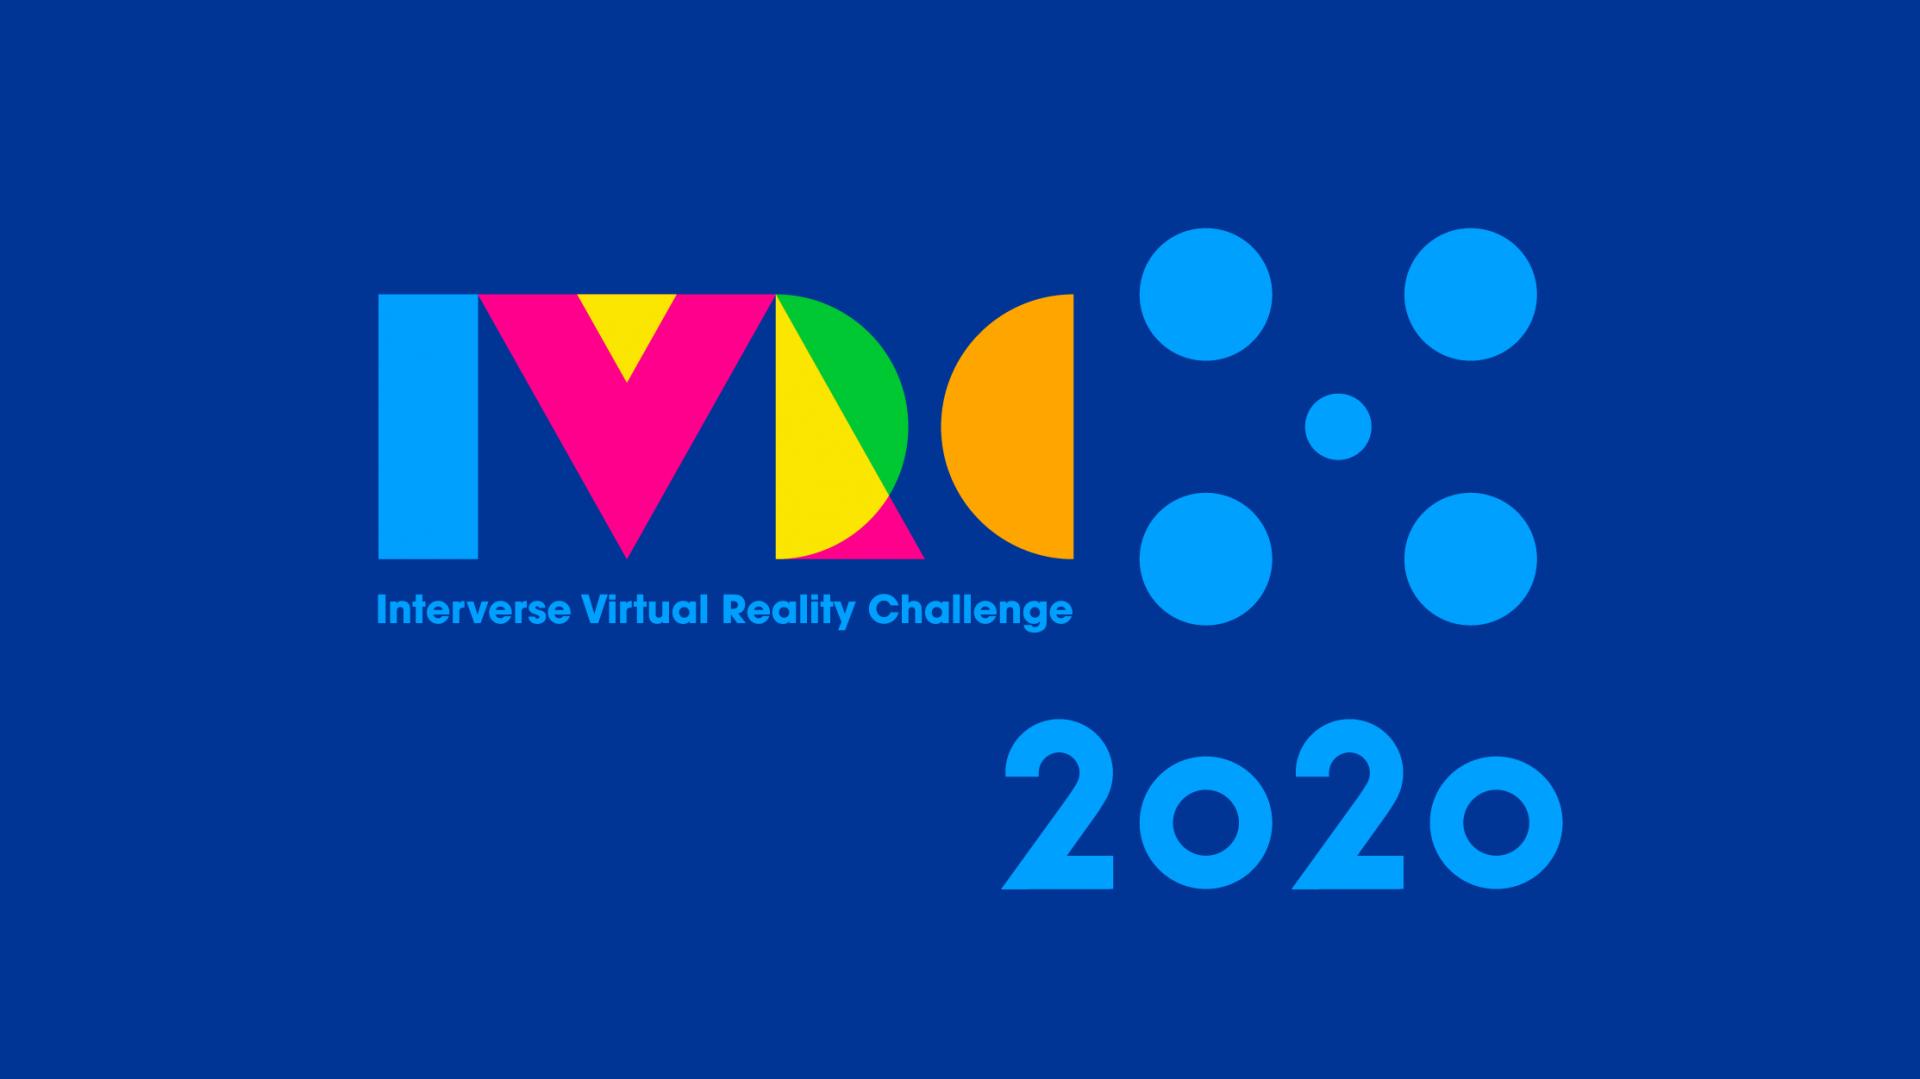 IVRC 2020